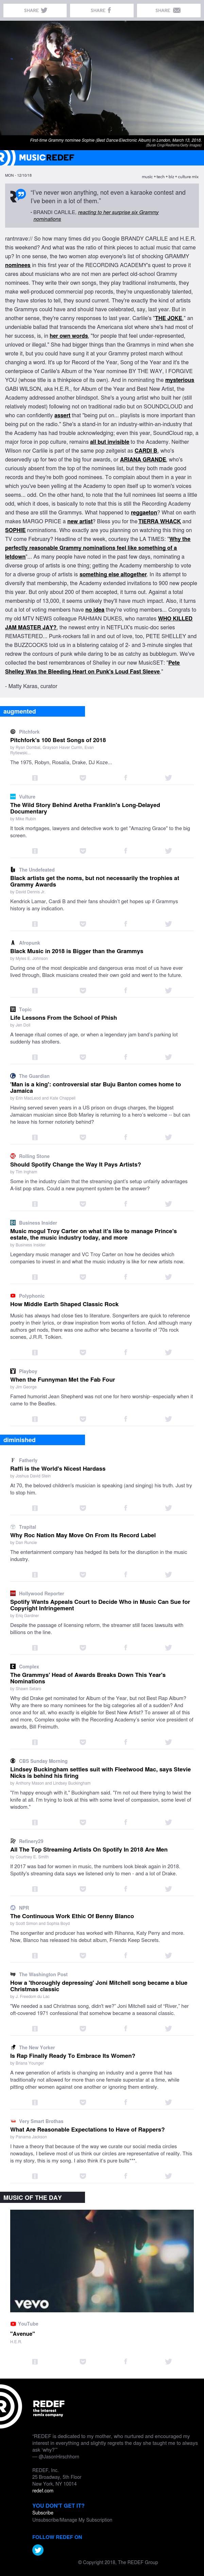 jason hirschhorn's @MusicREDEF: 12/10/2018 - Grammy Surprises, Pitchfork's Best, Big-Screen Aretha, Phishing Lessons, Buju Banton, Troy Carter...